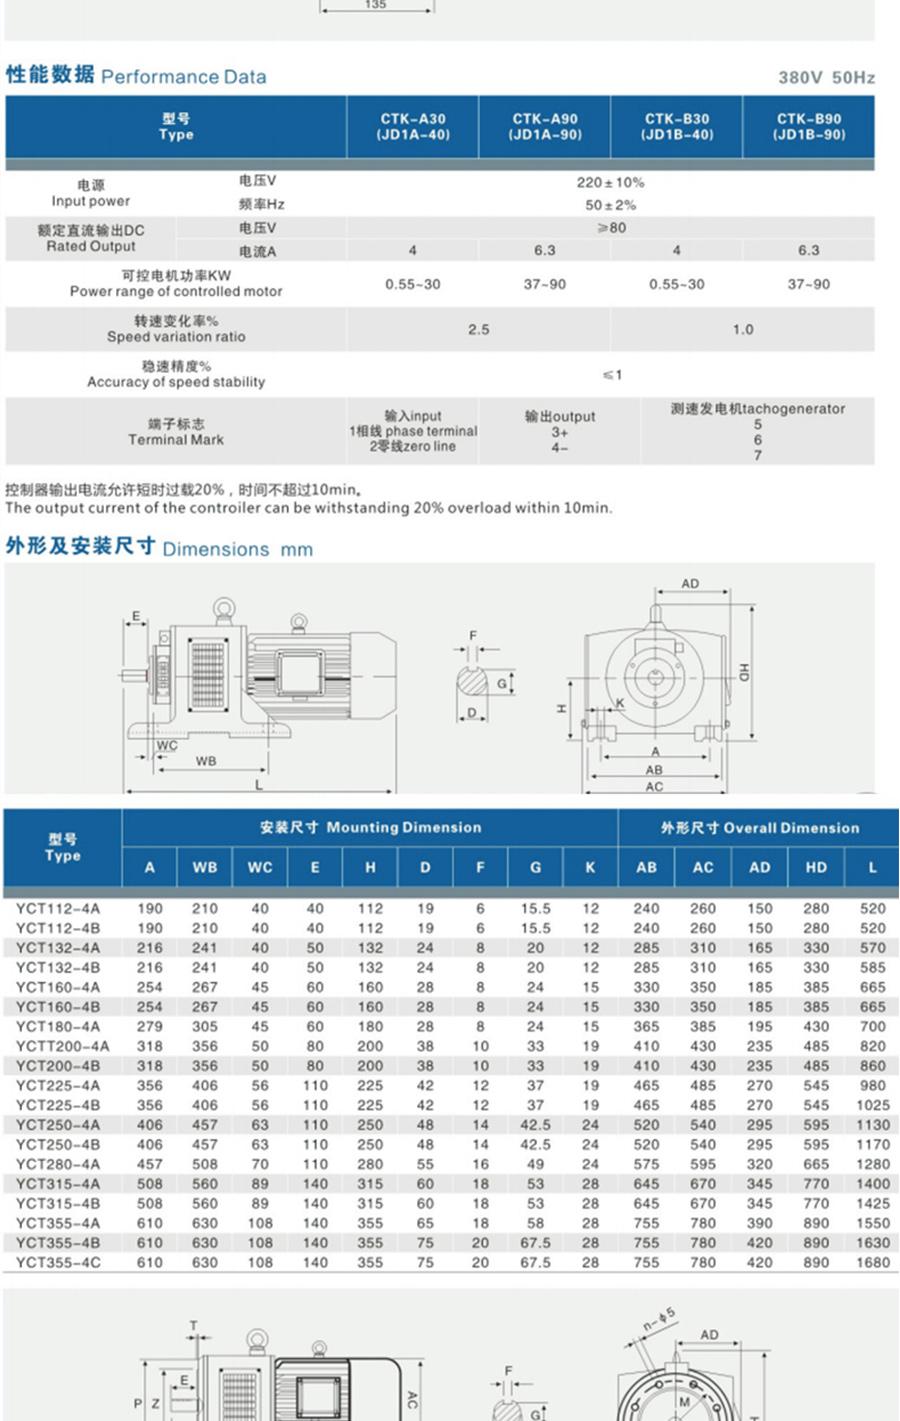 YCT-112-4A型号电机安装和尺寸与外形尺寸图4